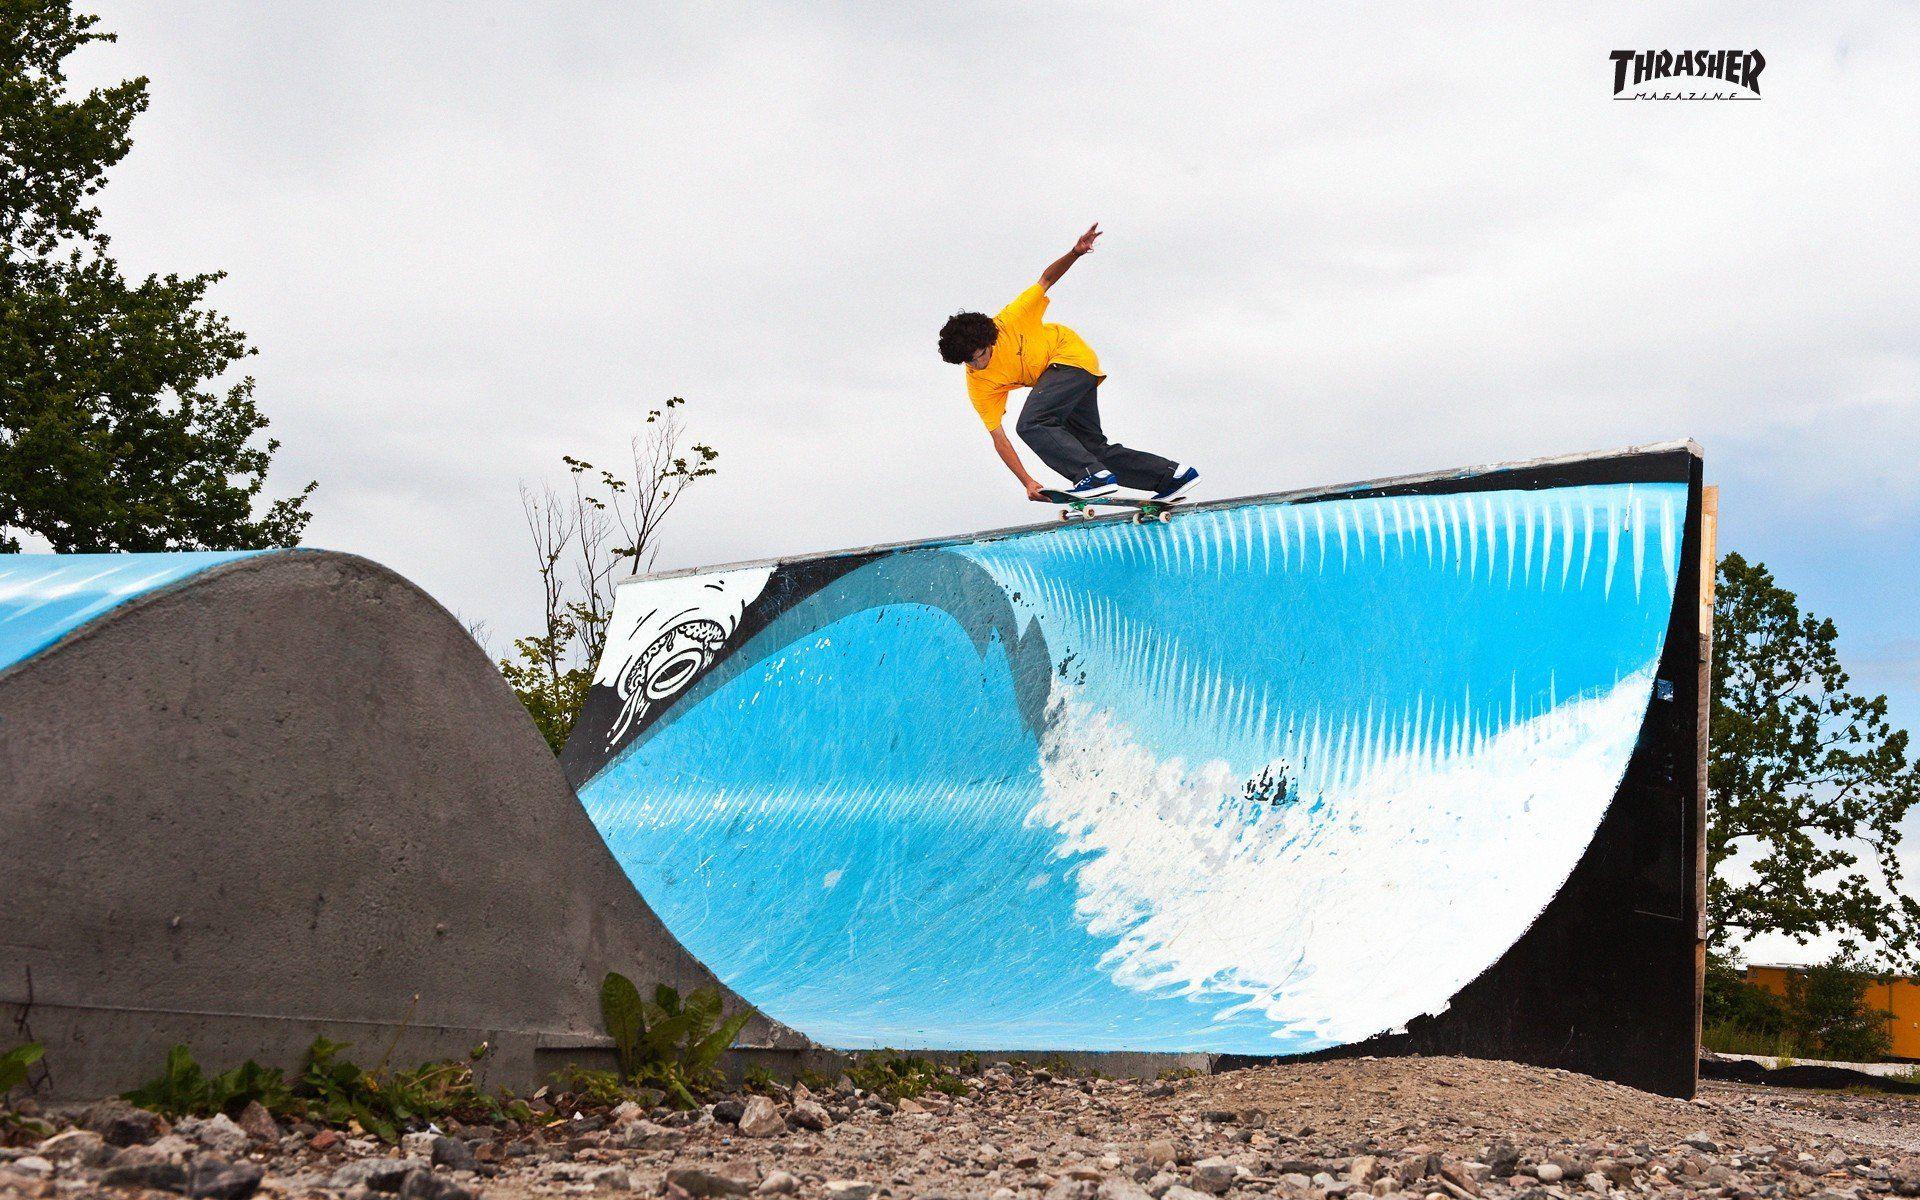 Skateboarding Computer Wallpapers Desktop Backgrounds 2048x1152 Wallpaper 45